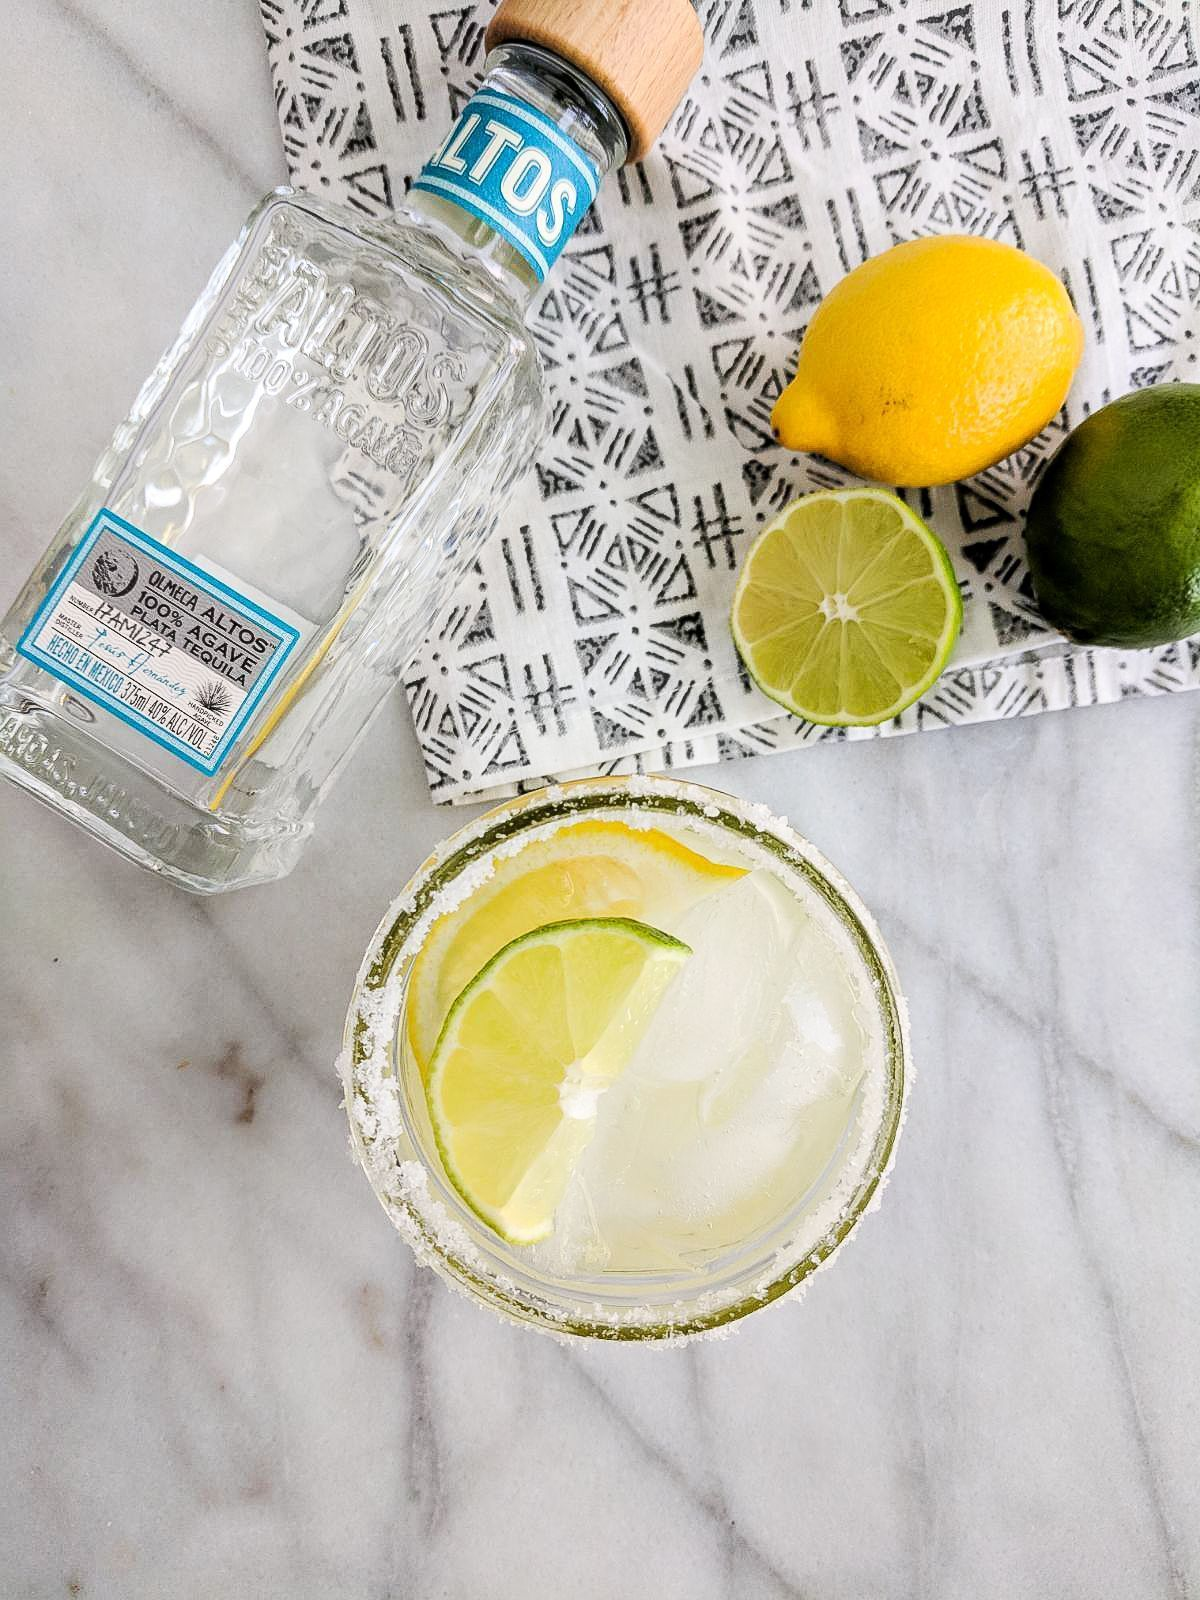 Simple Lemon Lime Margaritas Simple Lemon Lime Margaritas